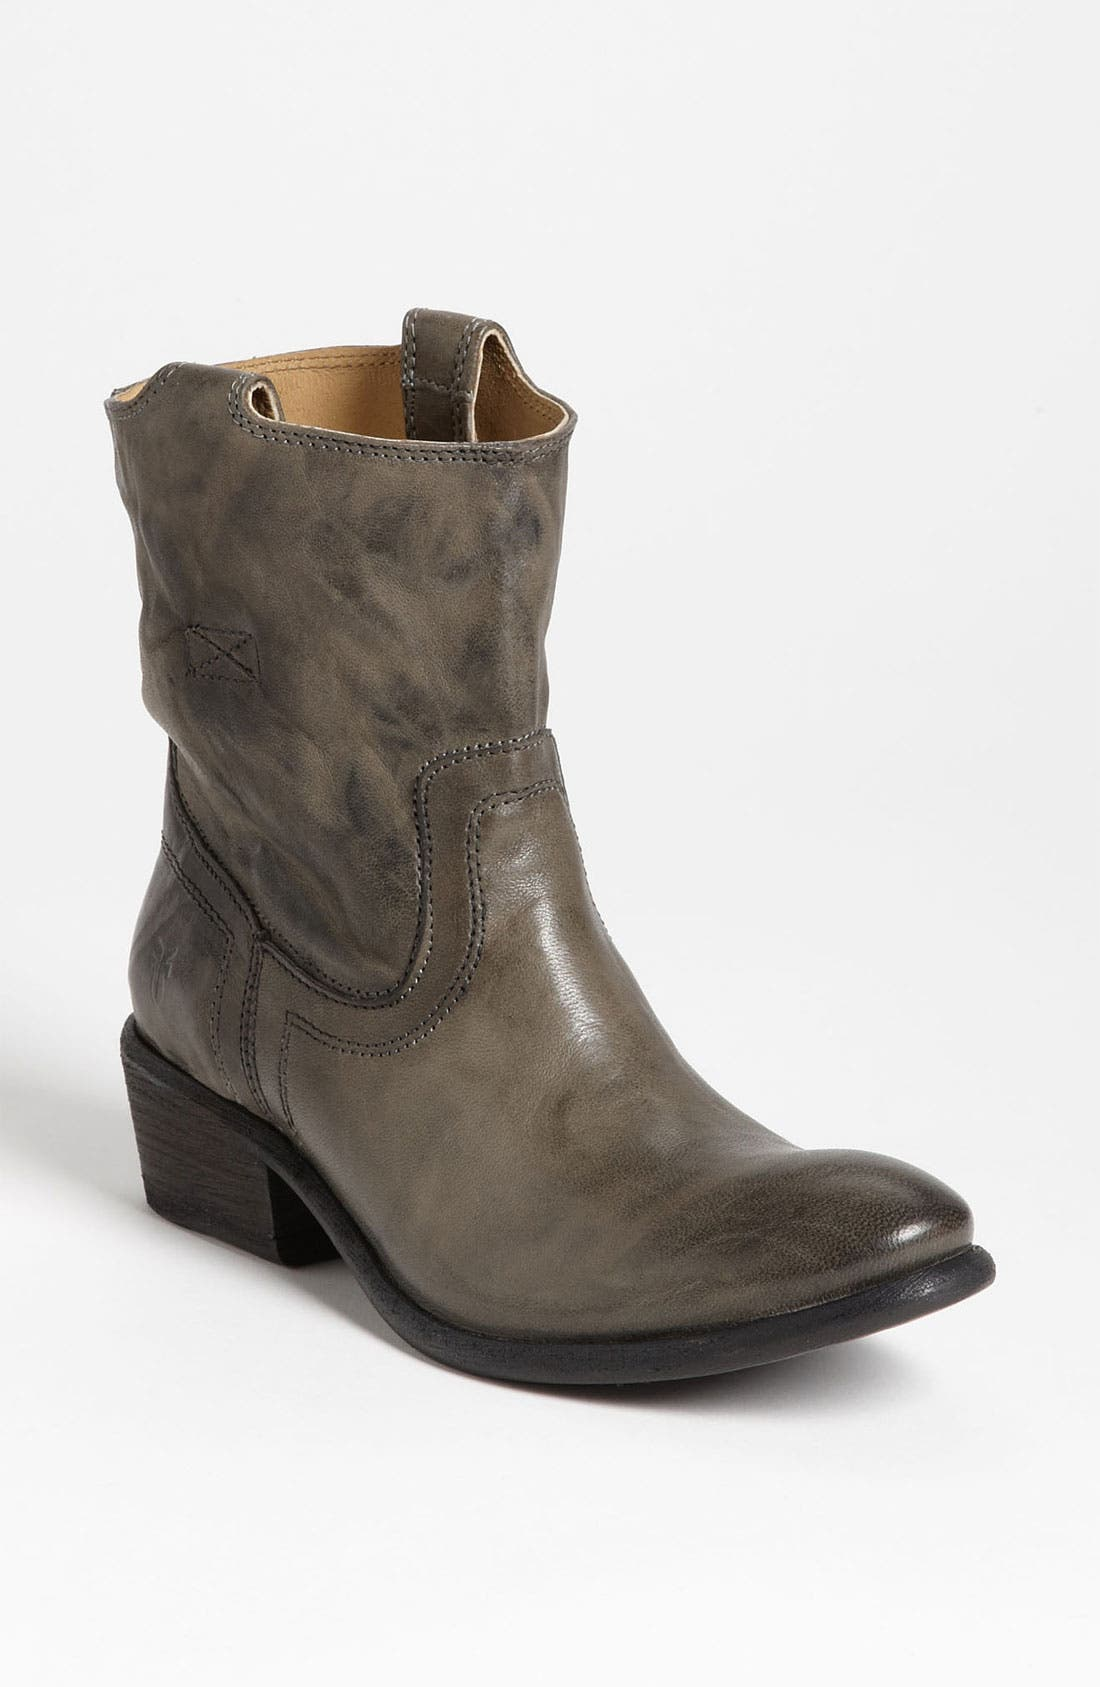 Alternate Image 1 Selected - Frye 'Carson Tab' Short Boot